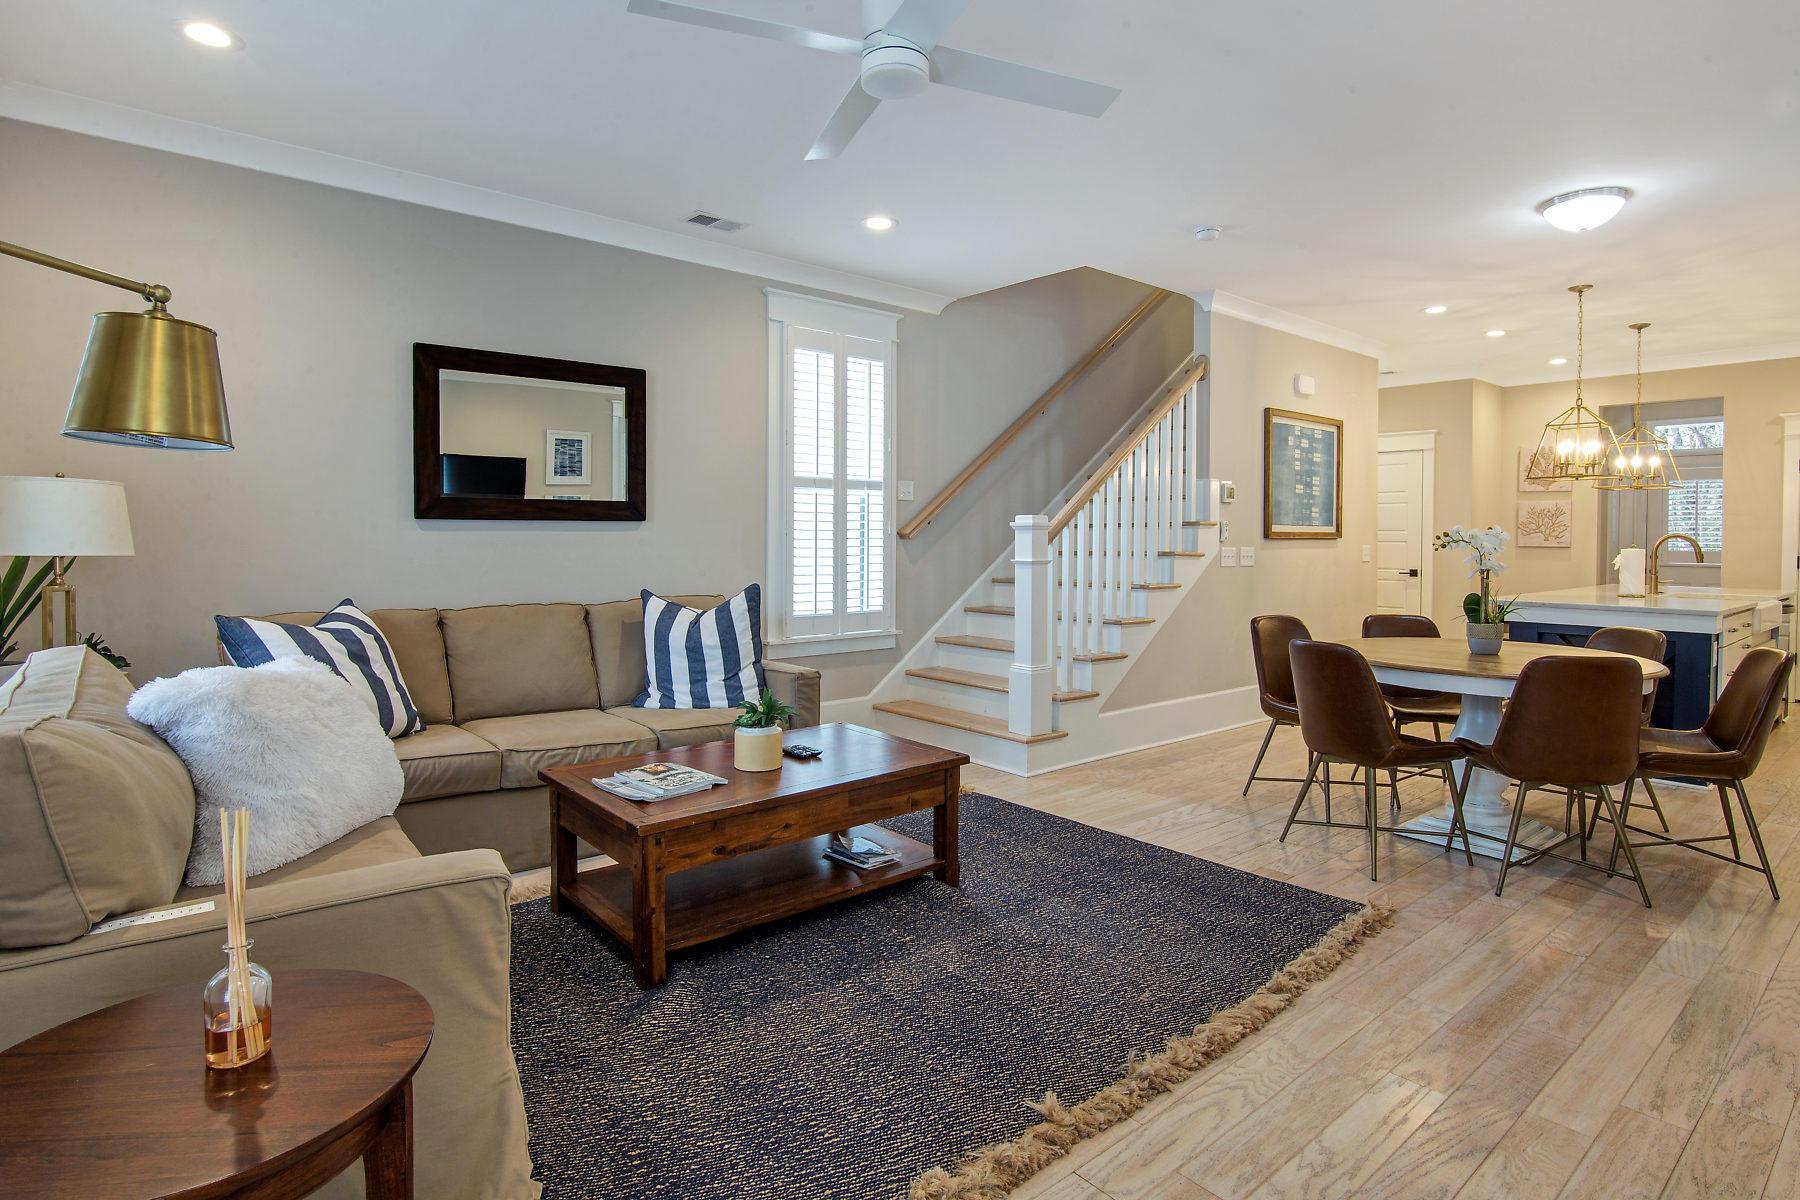 Sullivans Pointe Homes For Sale - 964 Key Colony, Mount Pleasant, SC - 0